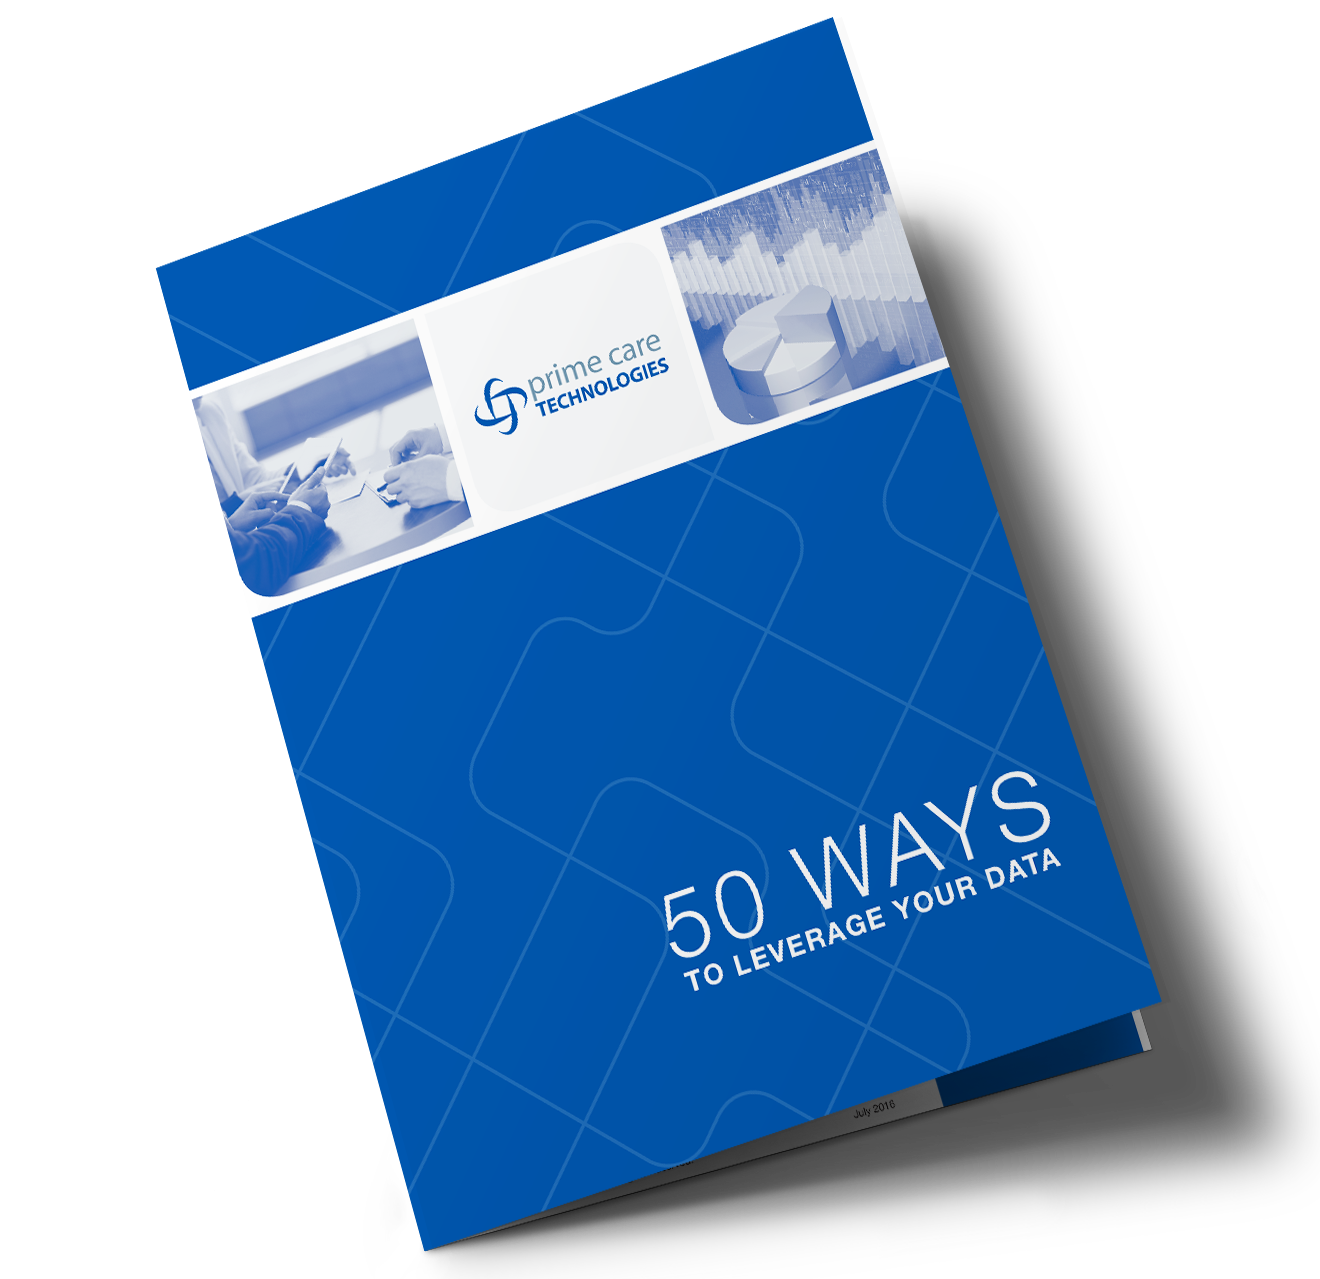 50 Ways to Leverage Data Brochure